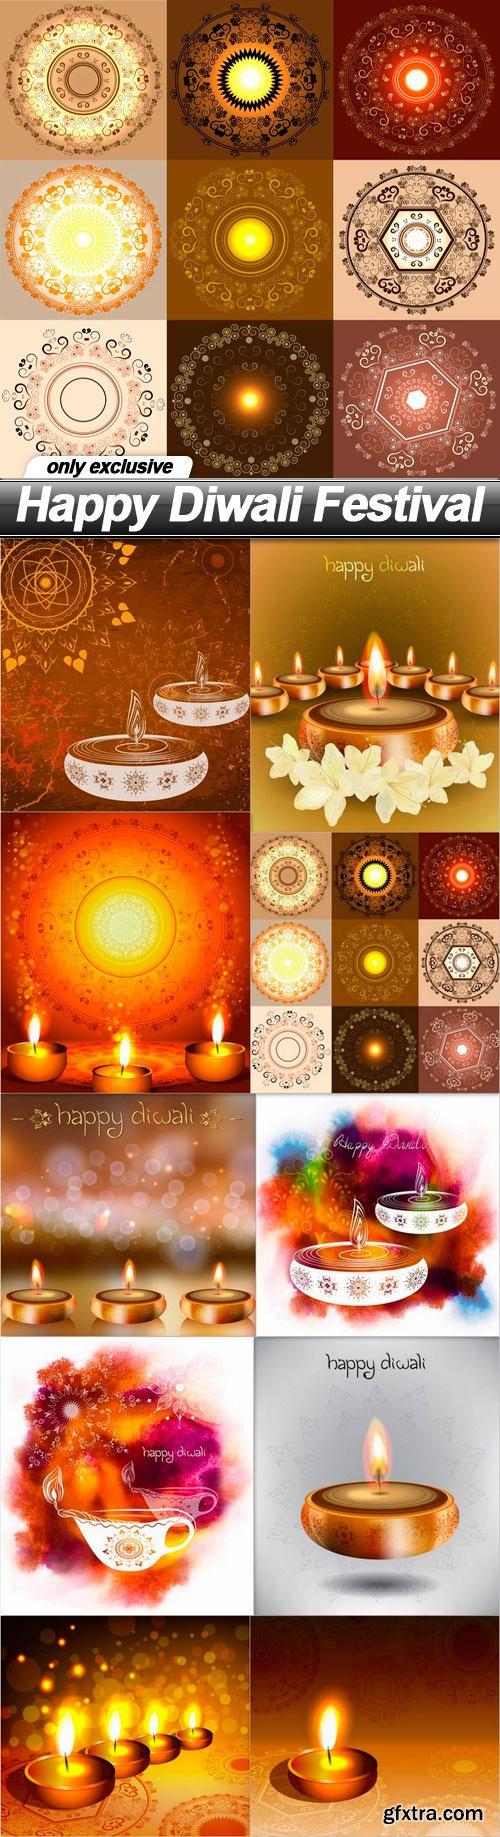 Happy Diwali Festival - 10 EPS